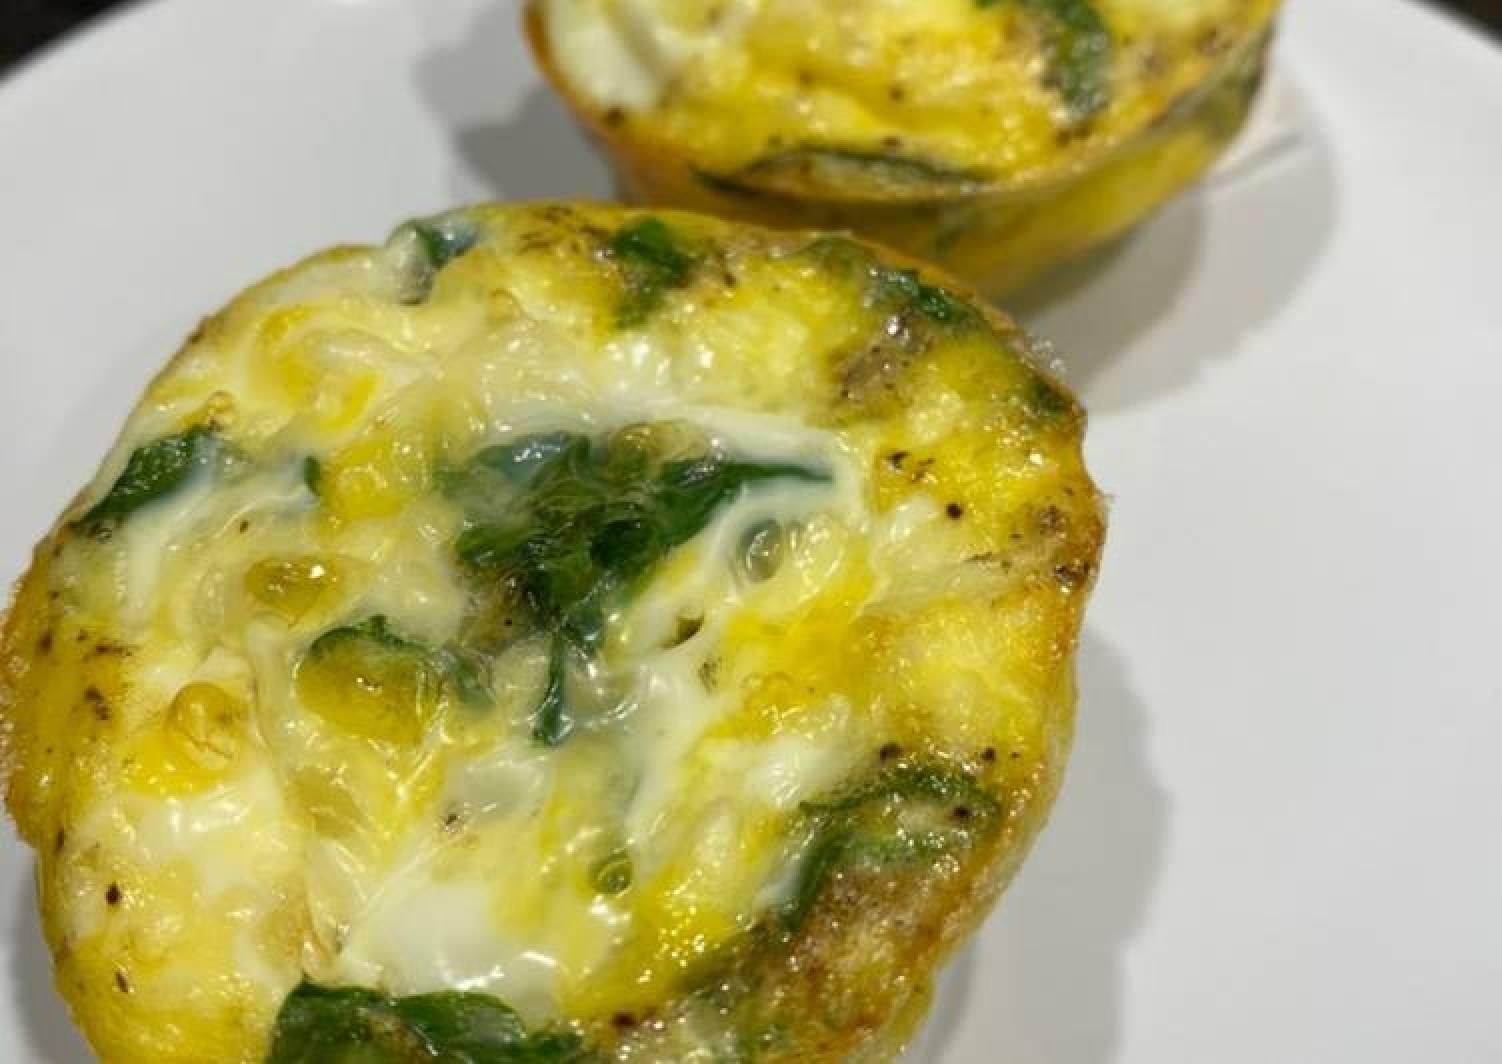 Spinach Feta Egg Bites